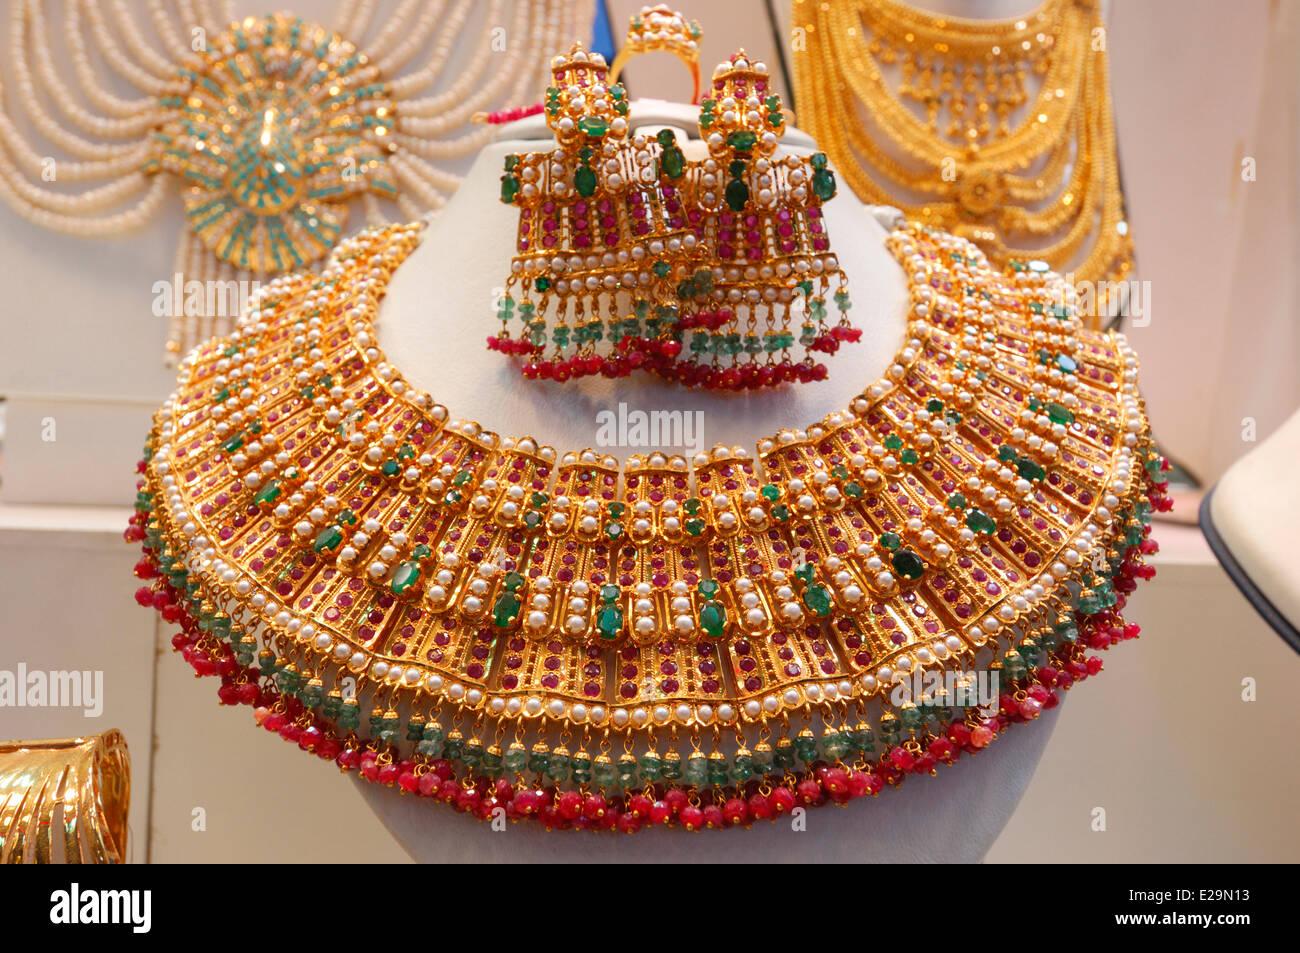 United Arab Emirates, Dubai emirate, Dubai, Deira, Gold Souk, Indian gold necklaces in a jewelry showcase in the - Stock Image